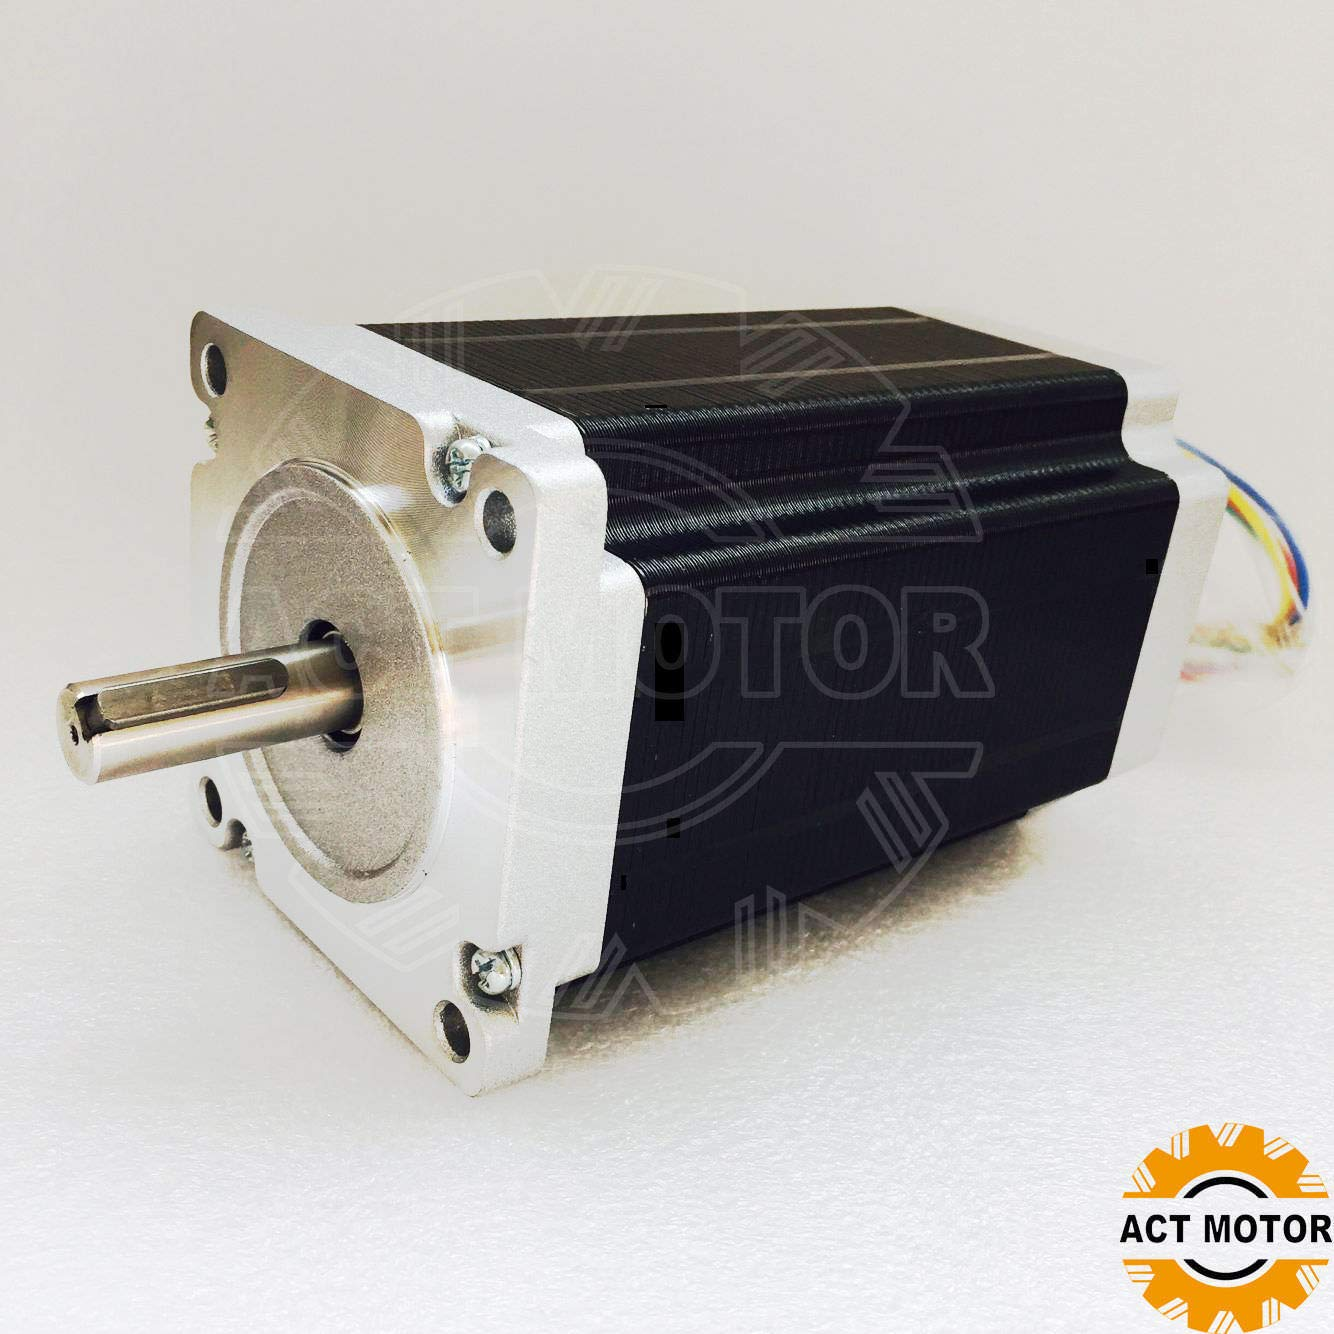 ACT MOTOR GmbH 1Axis Nema34 34HS5460D14L34J5-1 150mm 12Nm 6A φ 14mm Keyway CNC